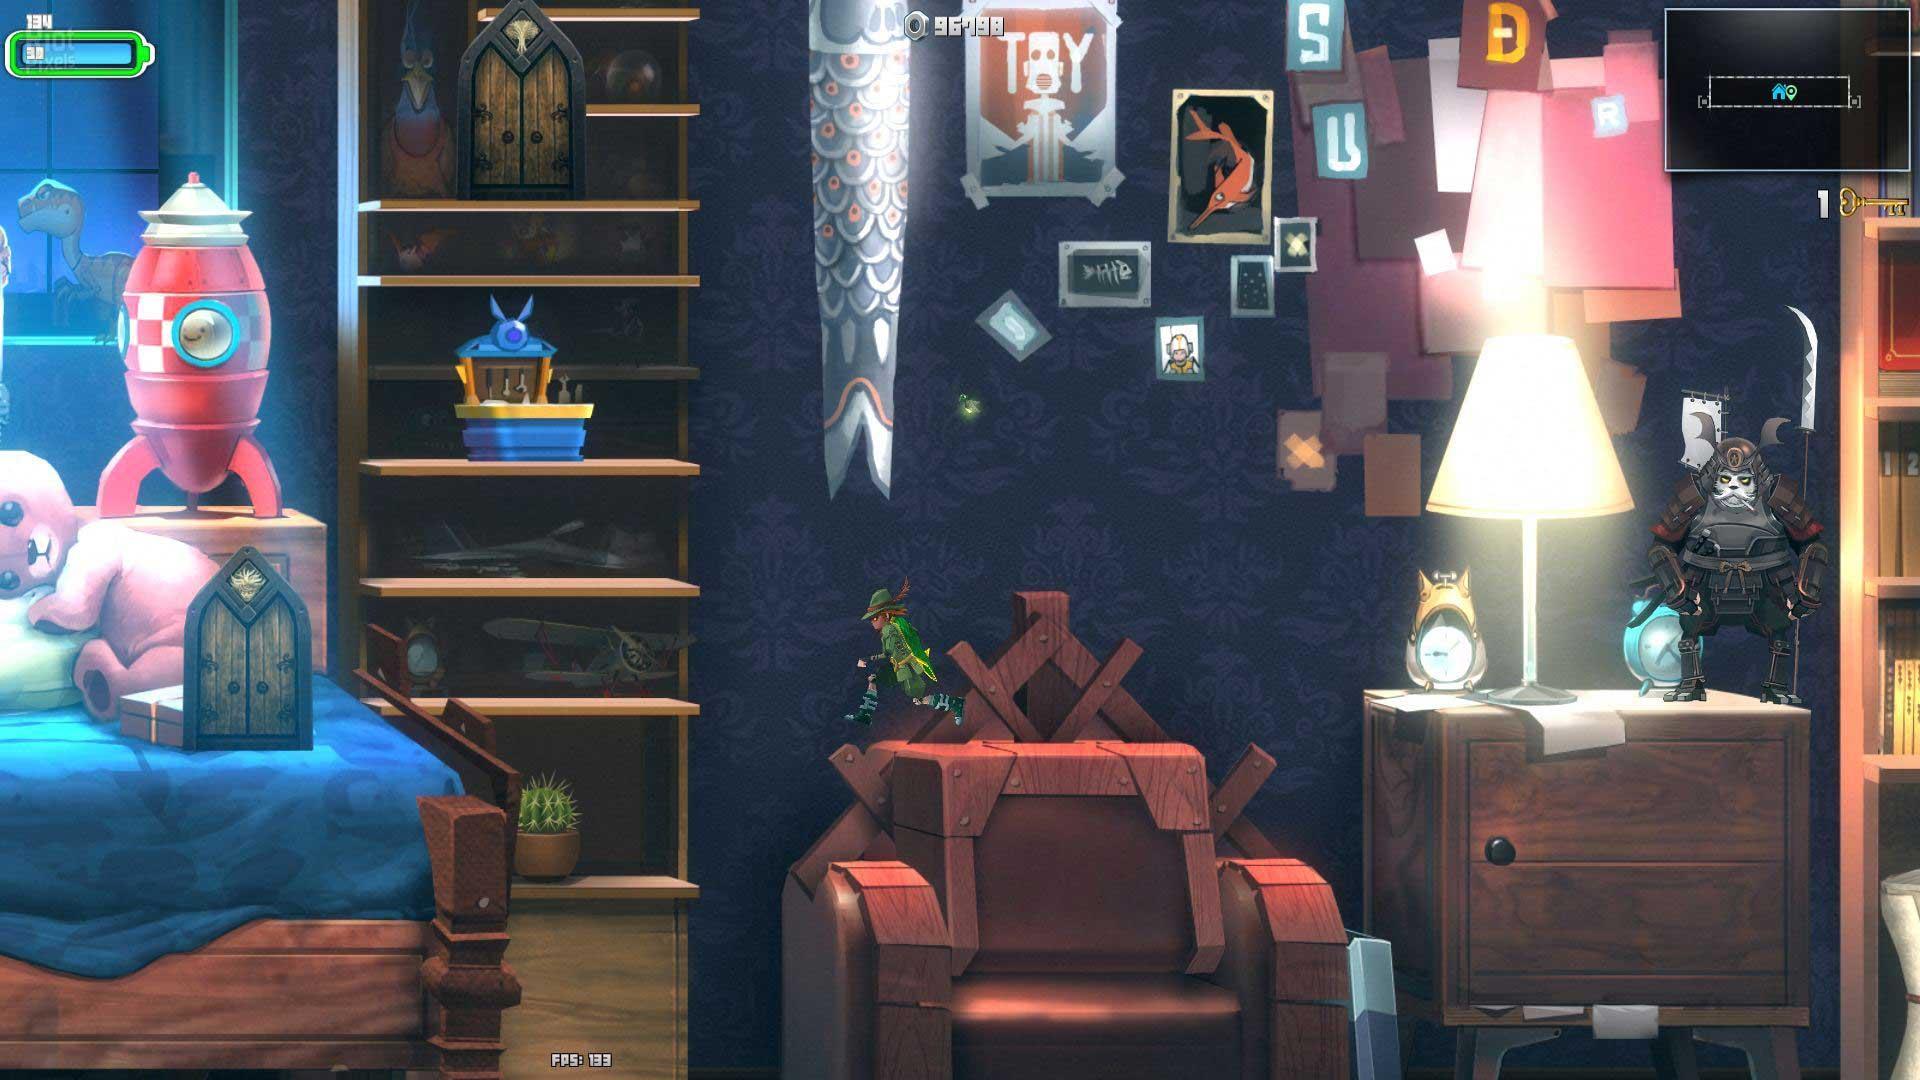 Xbox国服迎来Rougelike类横版动作新游《玩具大冒险:失落与发现》